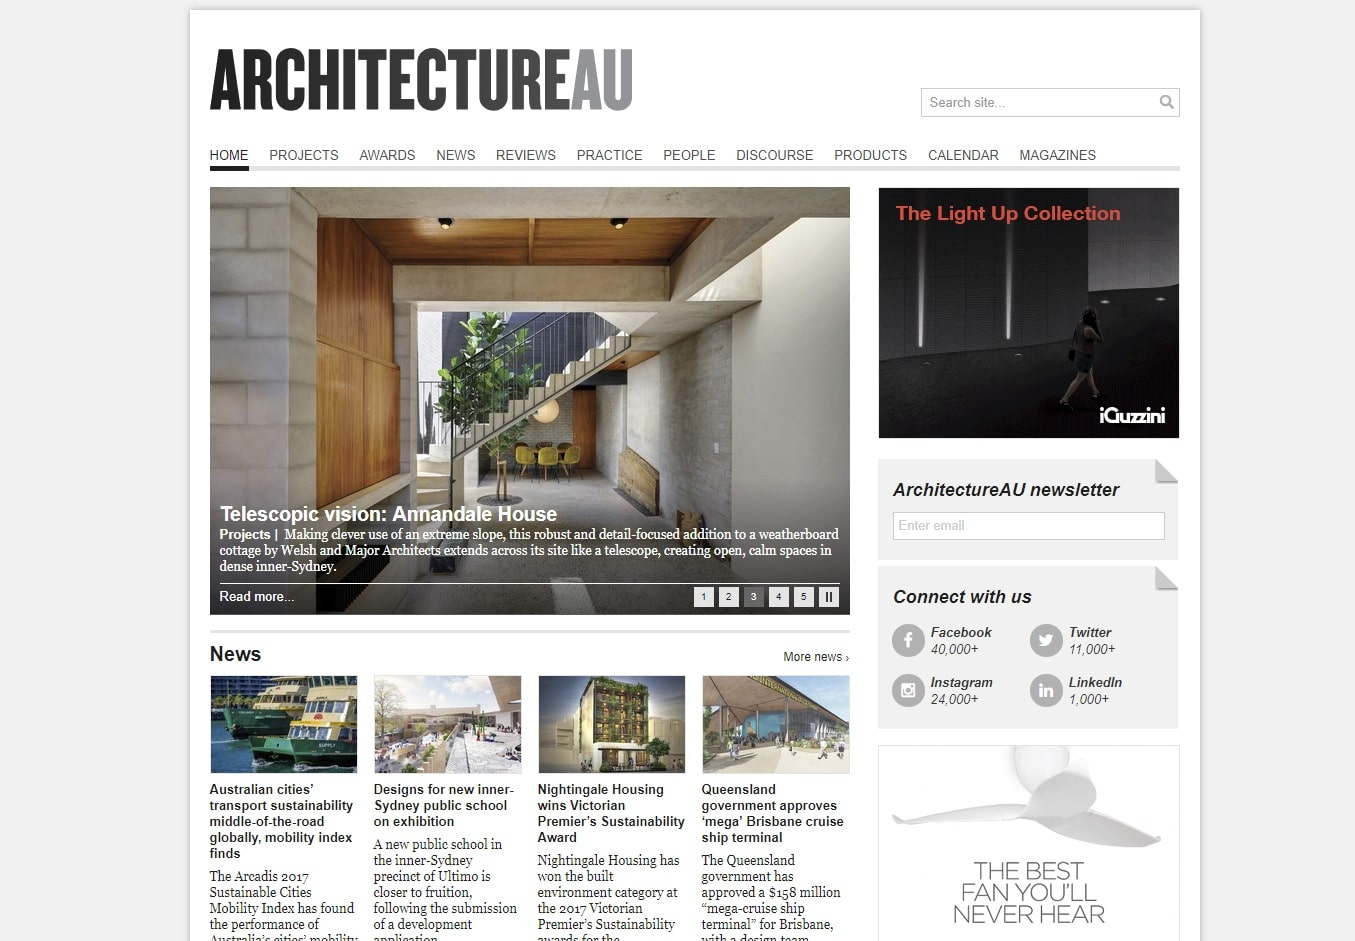 architectureau